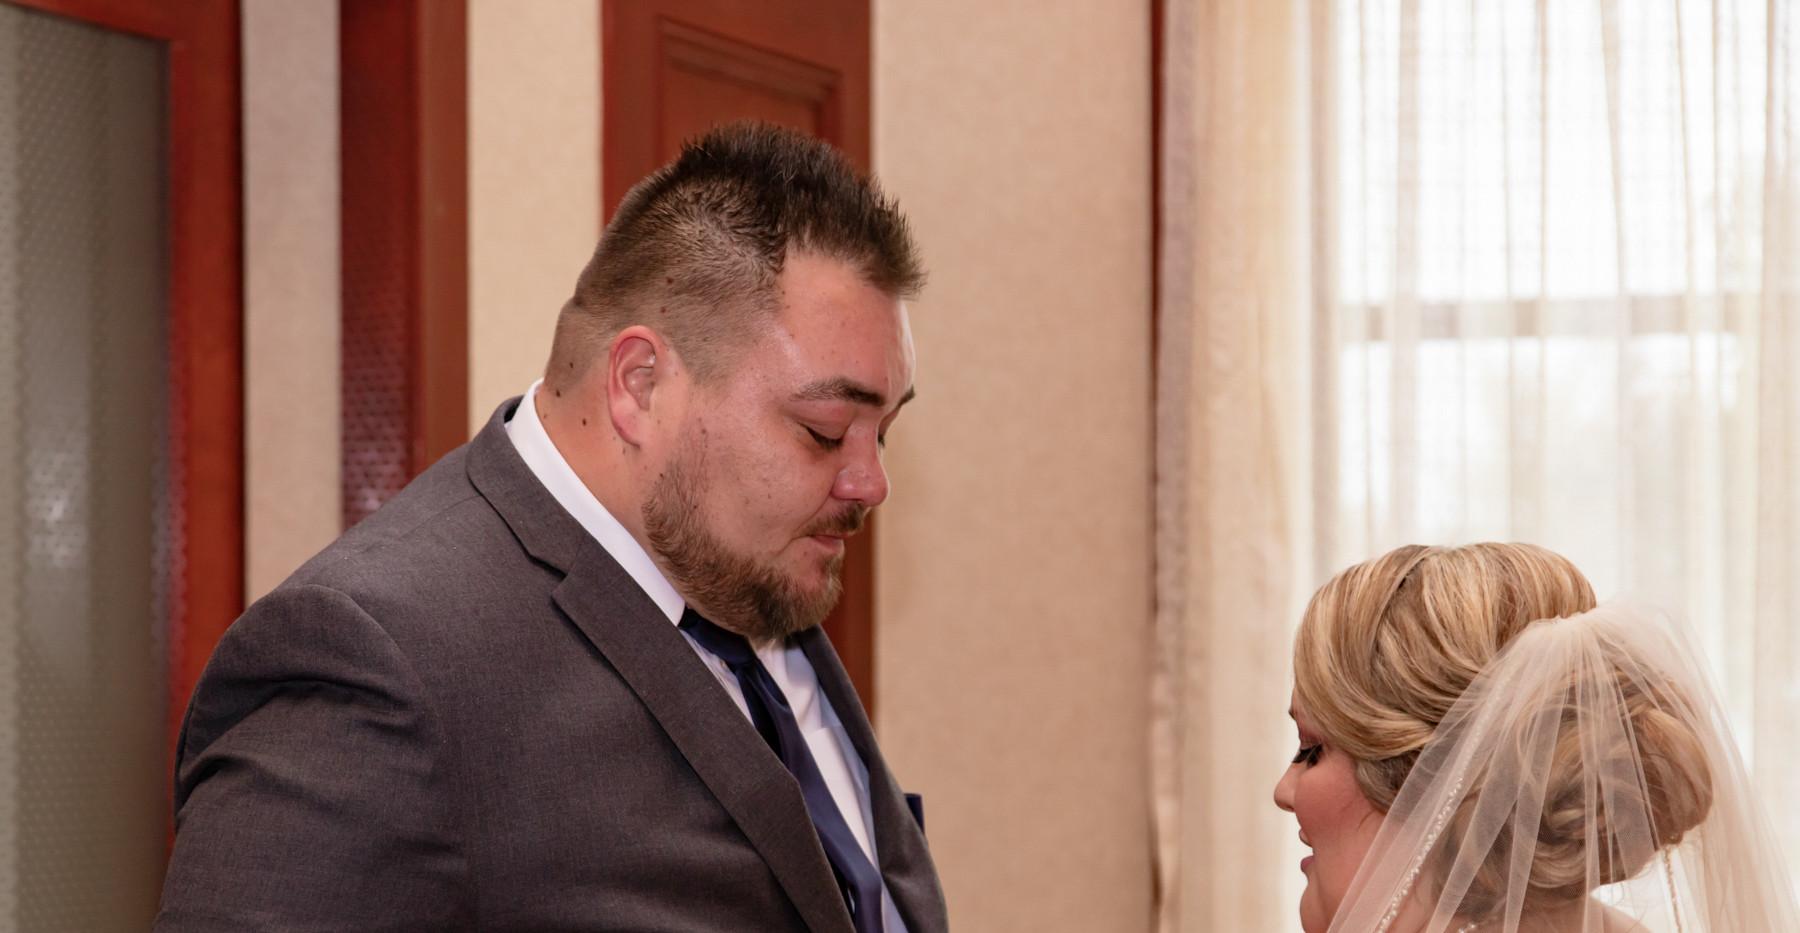 T+T Wedding - 1z3a5920.jpg